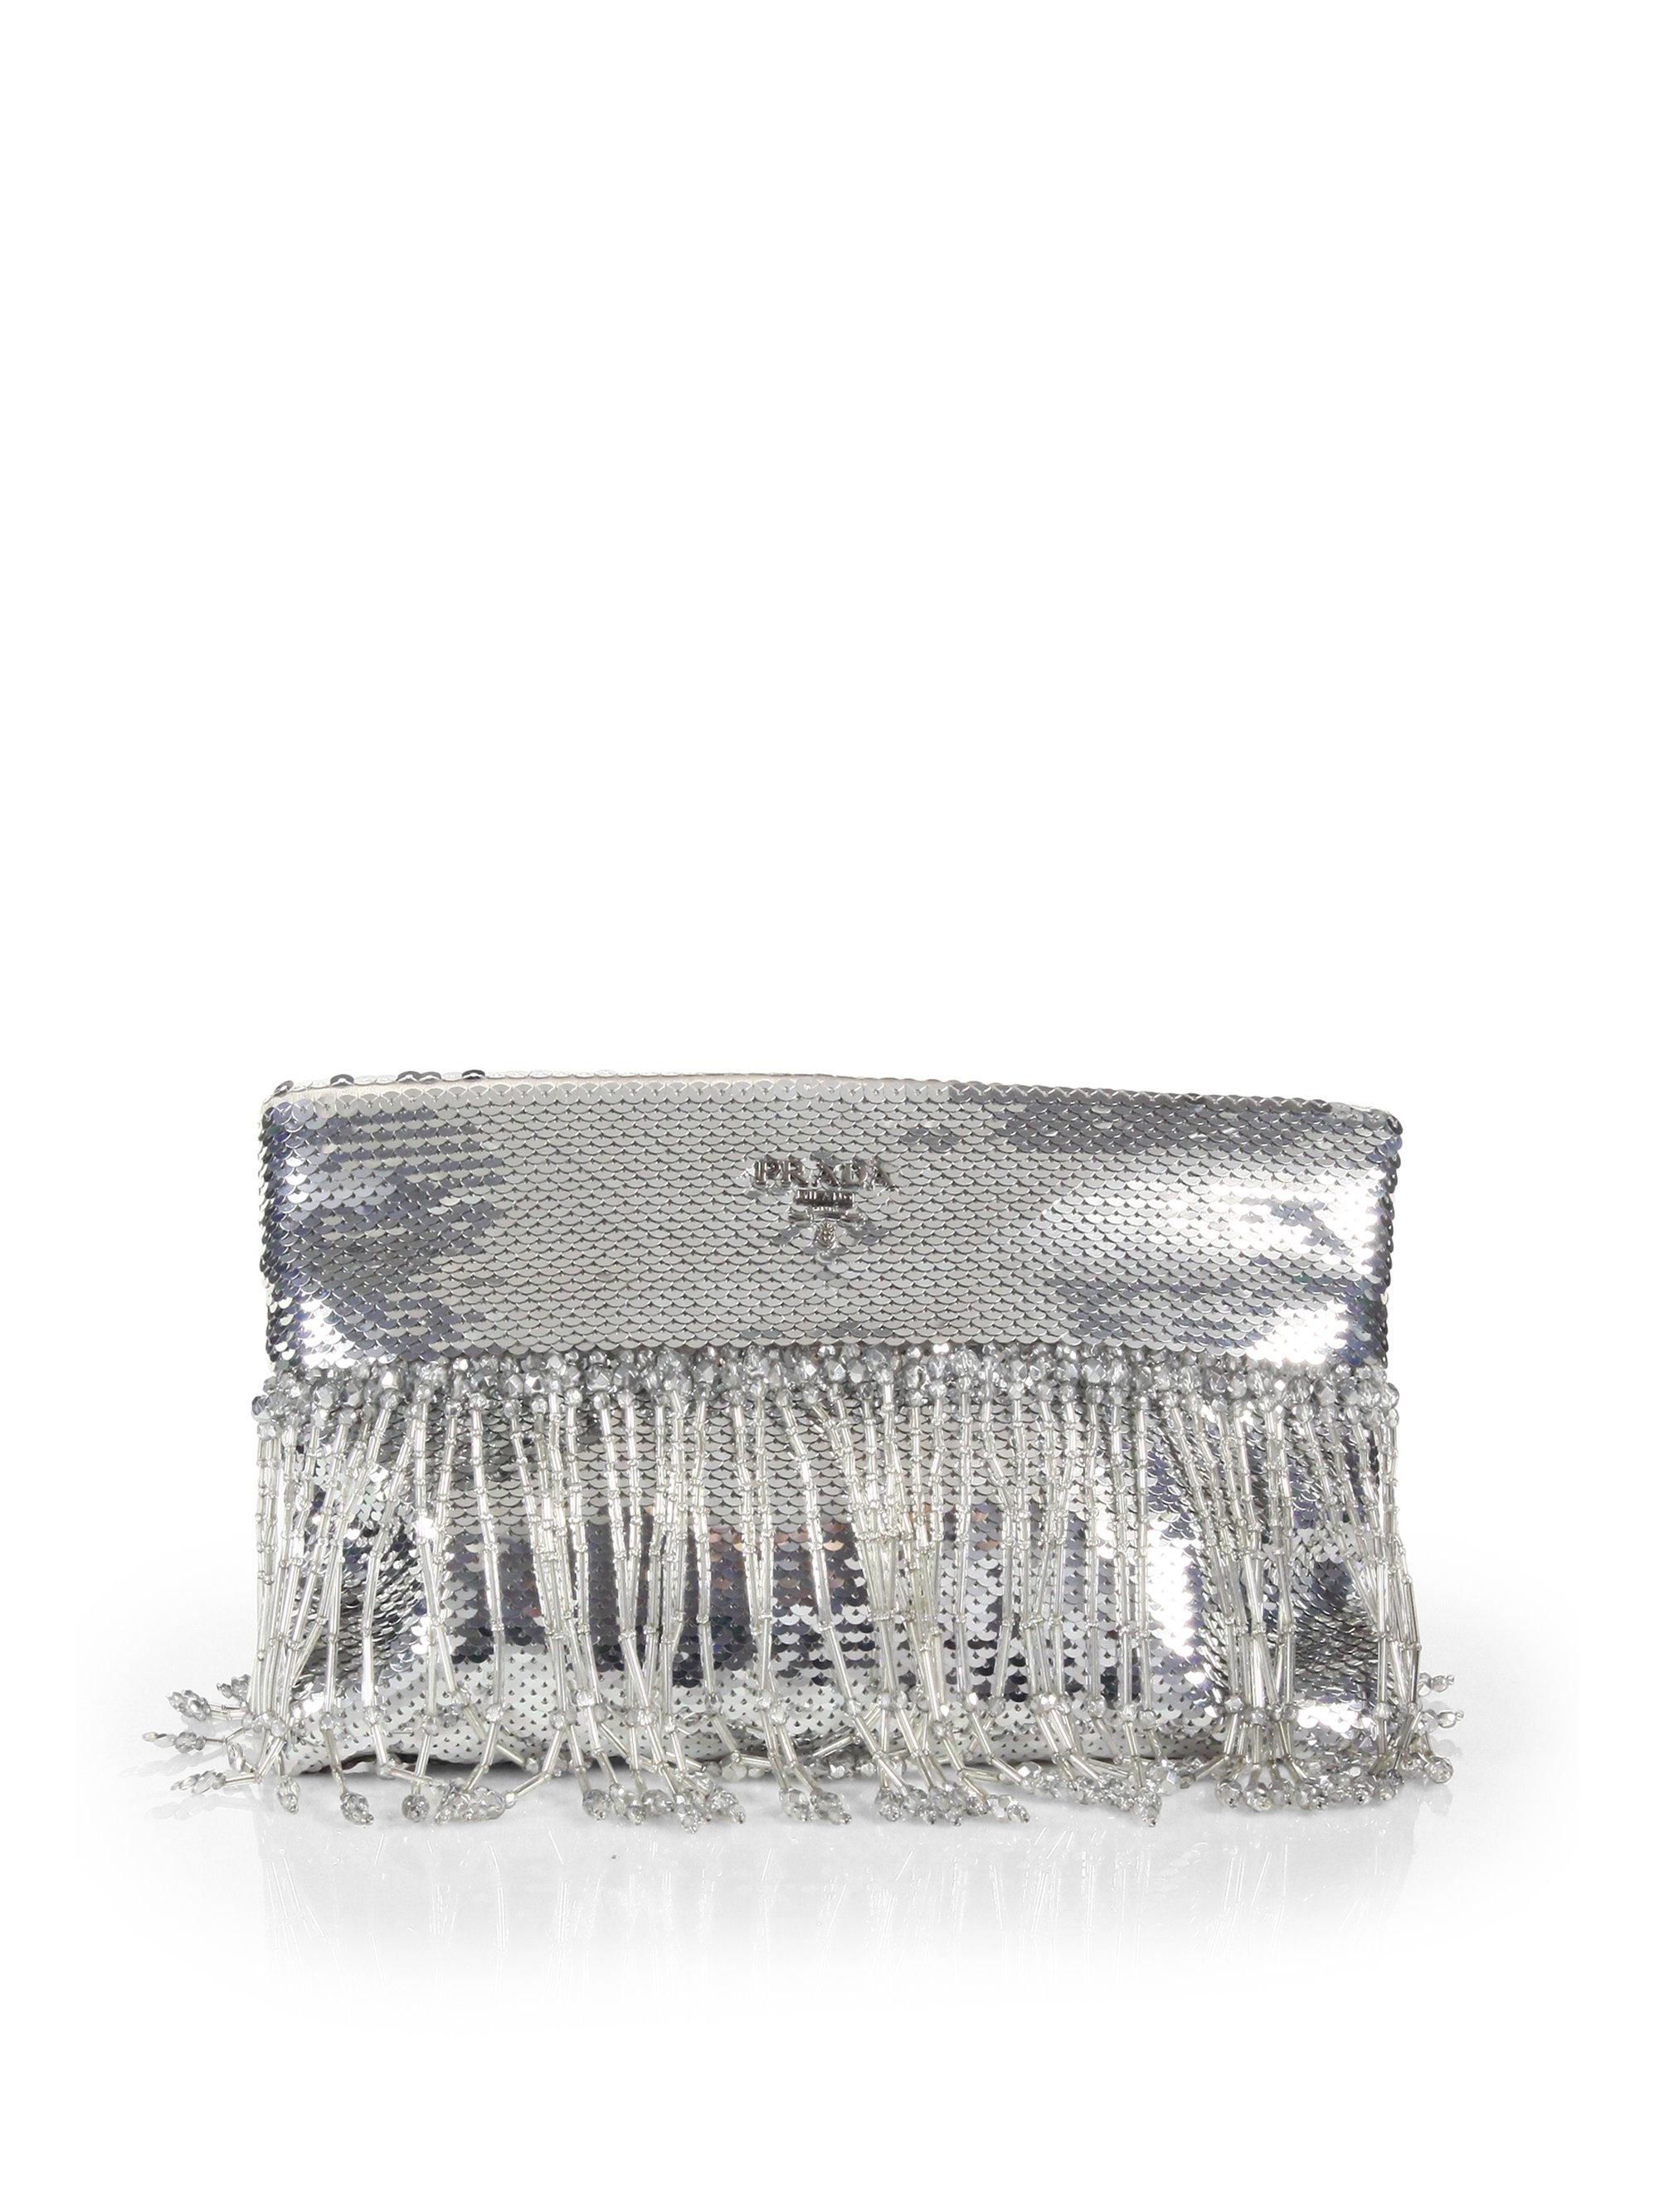 ba5057d03677 Prada Paillettes Fringe Clutch in Metallic - Lyst